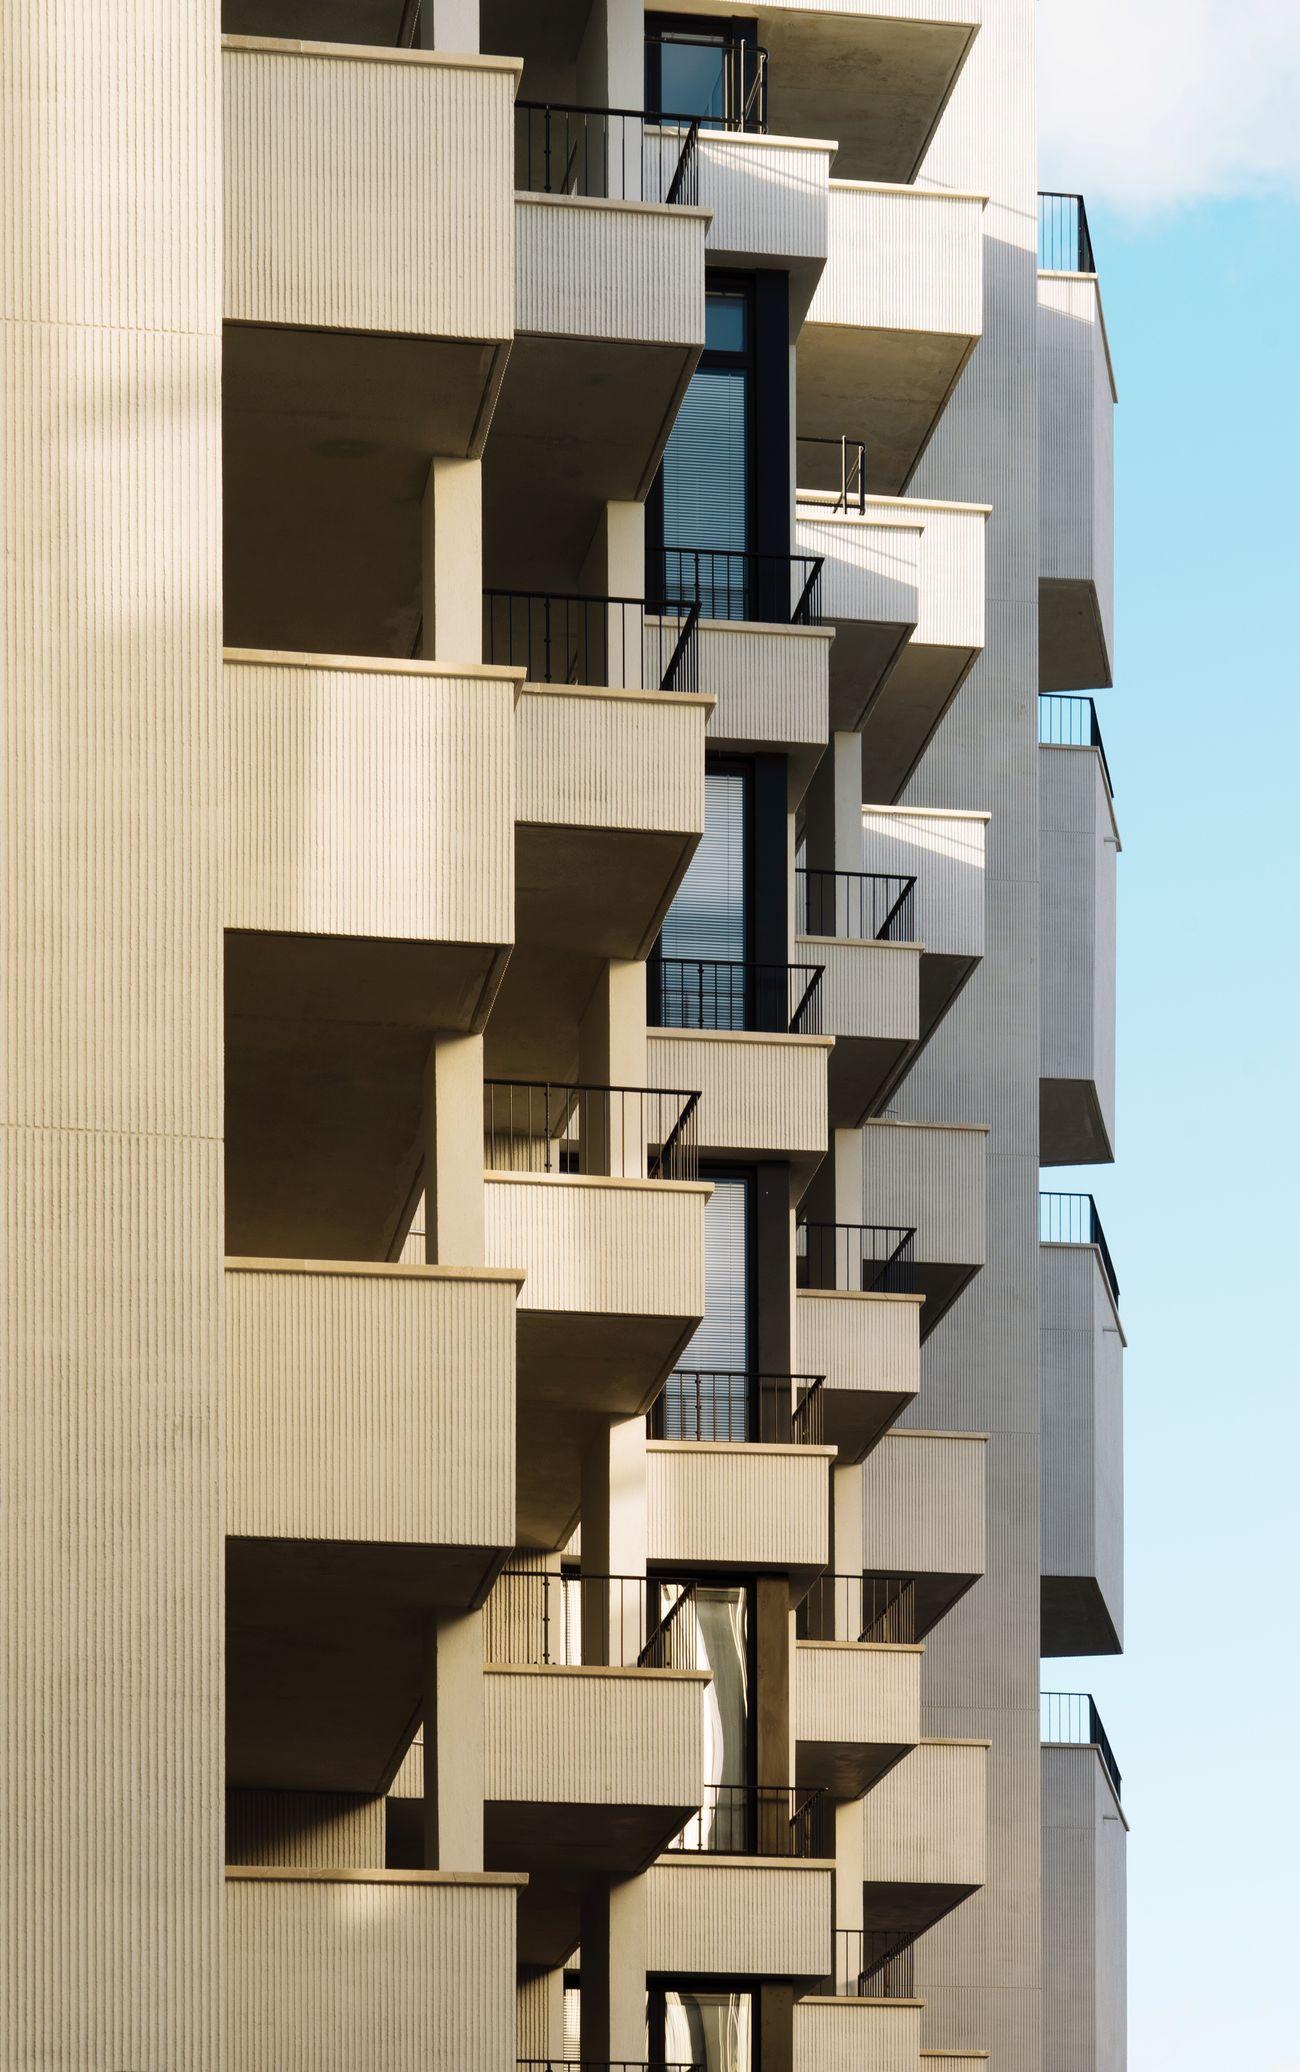 Façade Facades Detail Balcony Architecture Architecture_collection Profile View Apartment EyeEm Best Edits TheWeekOnEyeEM EyeEmBestPics EyeEm Best Shots The Architect - 2017 EyeEm Awards Architectural Detail Building